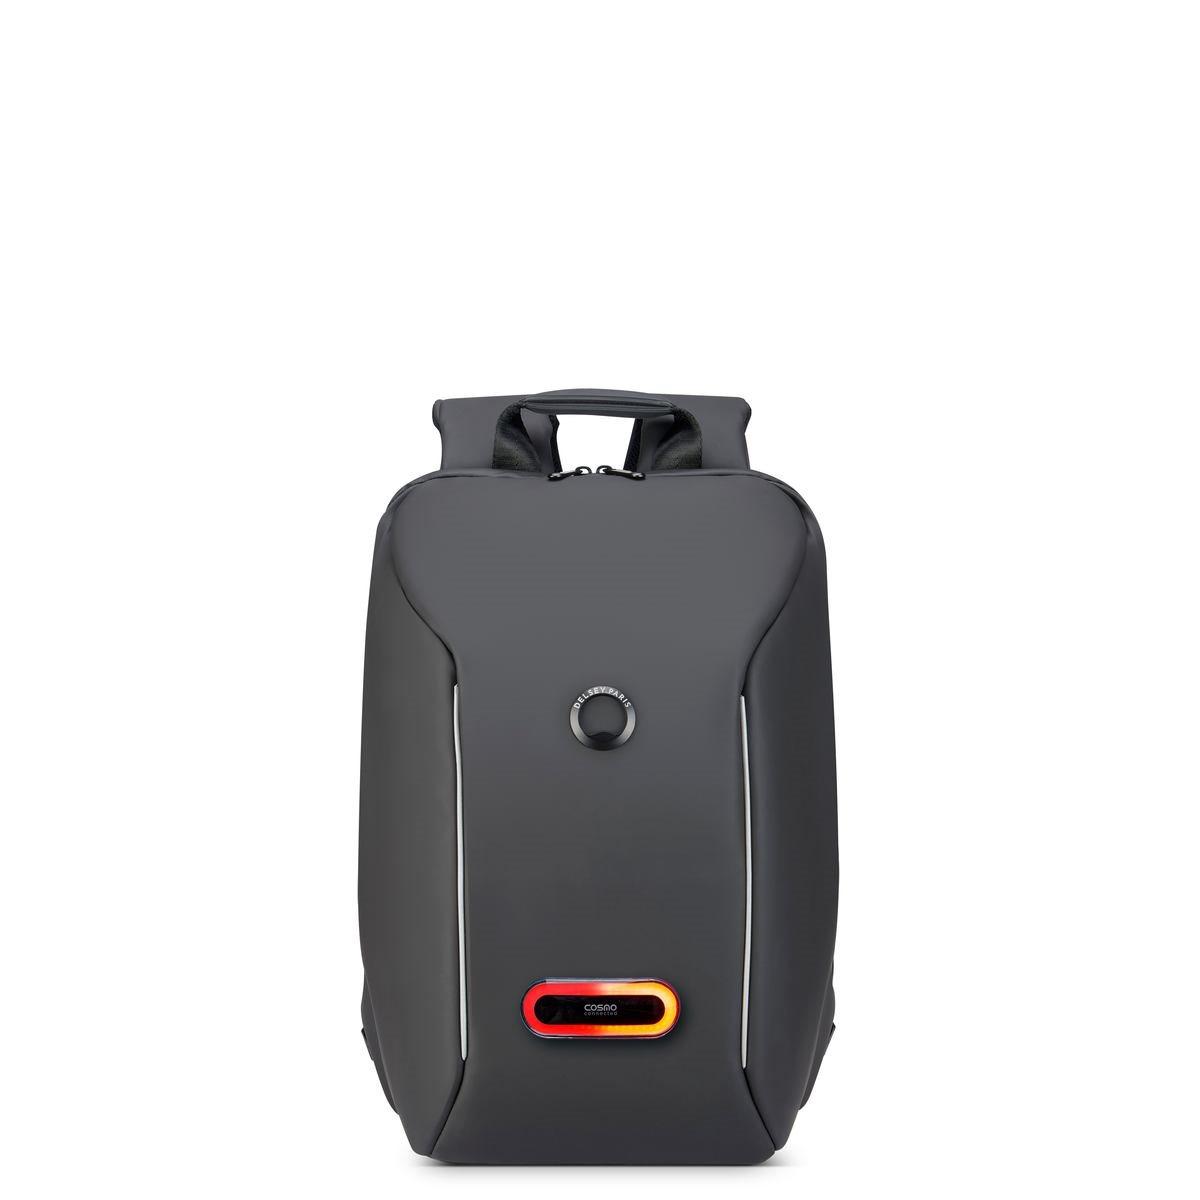 Delsey Σακίδιο πλάτης με θέση PC 14   44,5x29,5x16,5cm Securain Connected Black